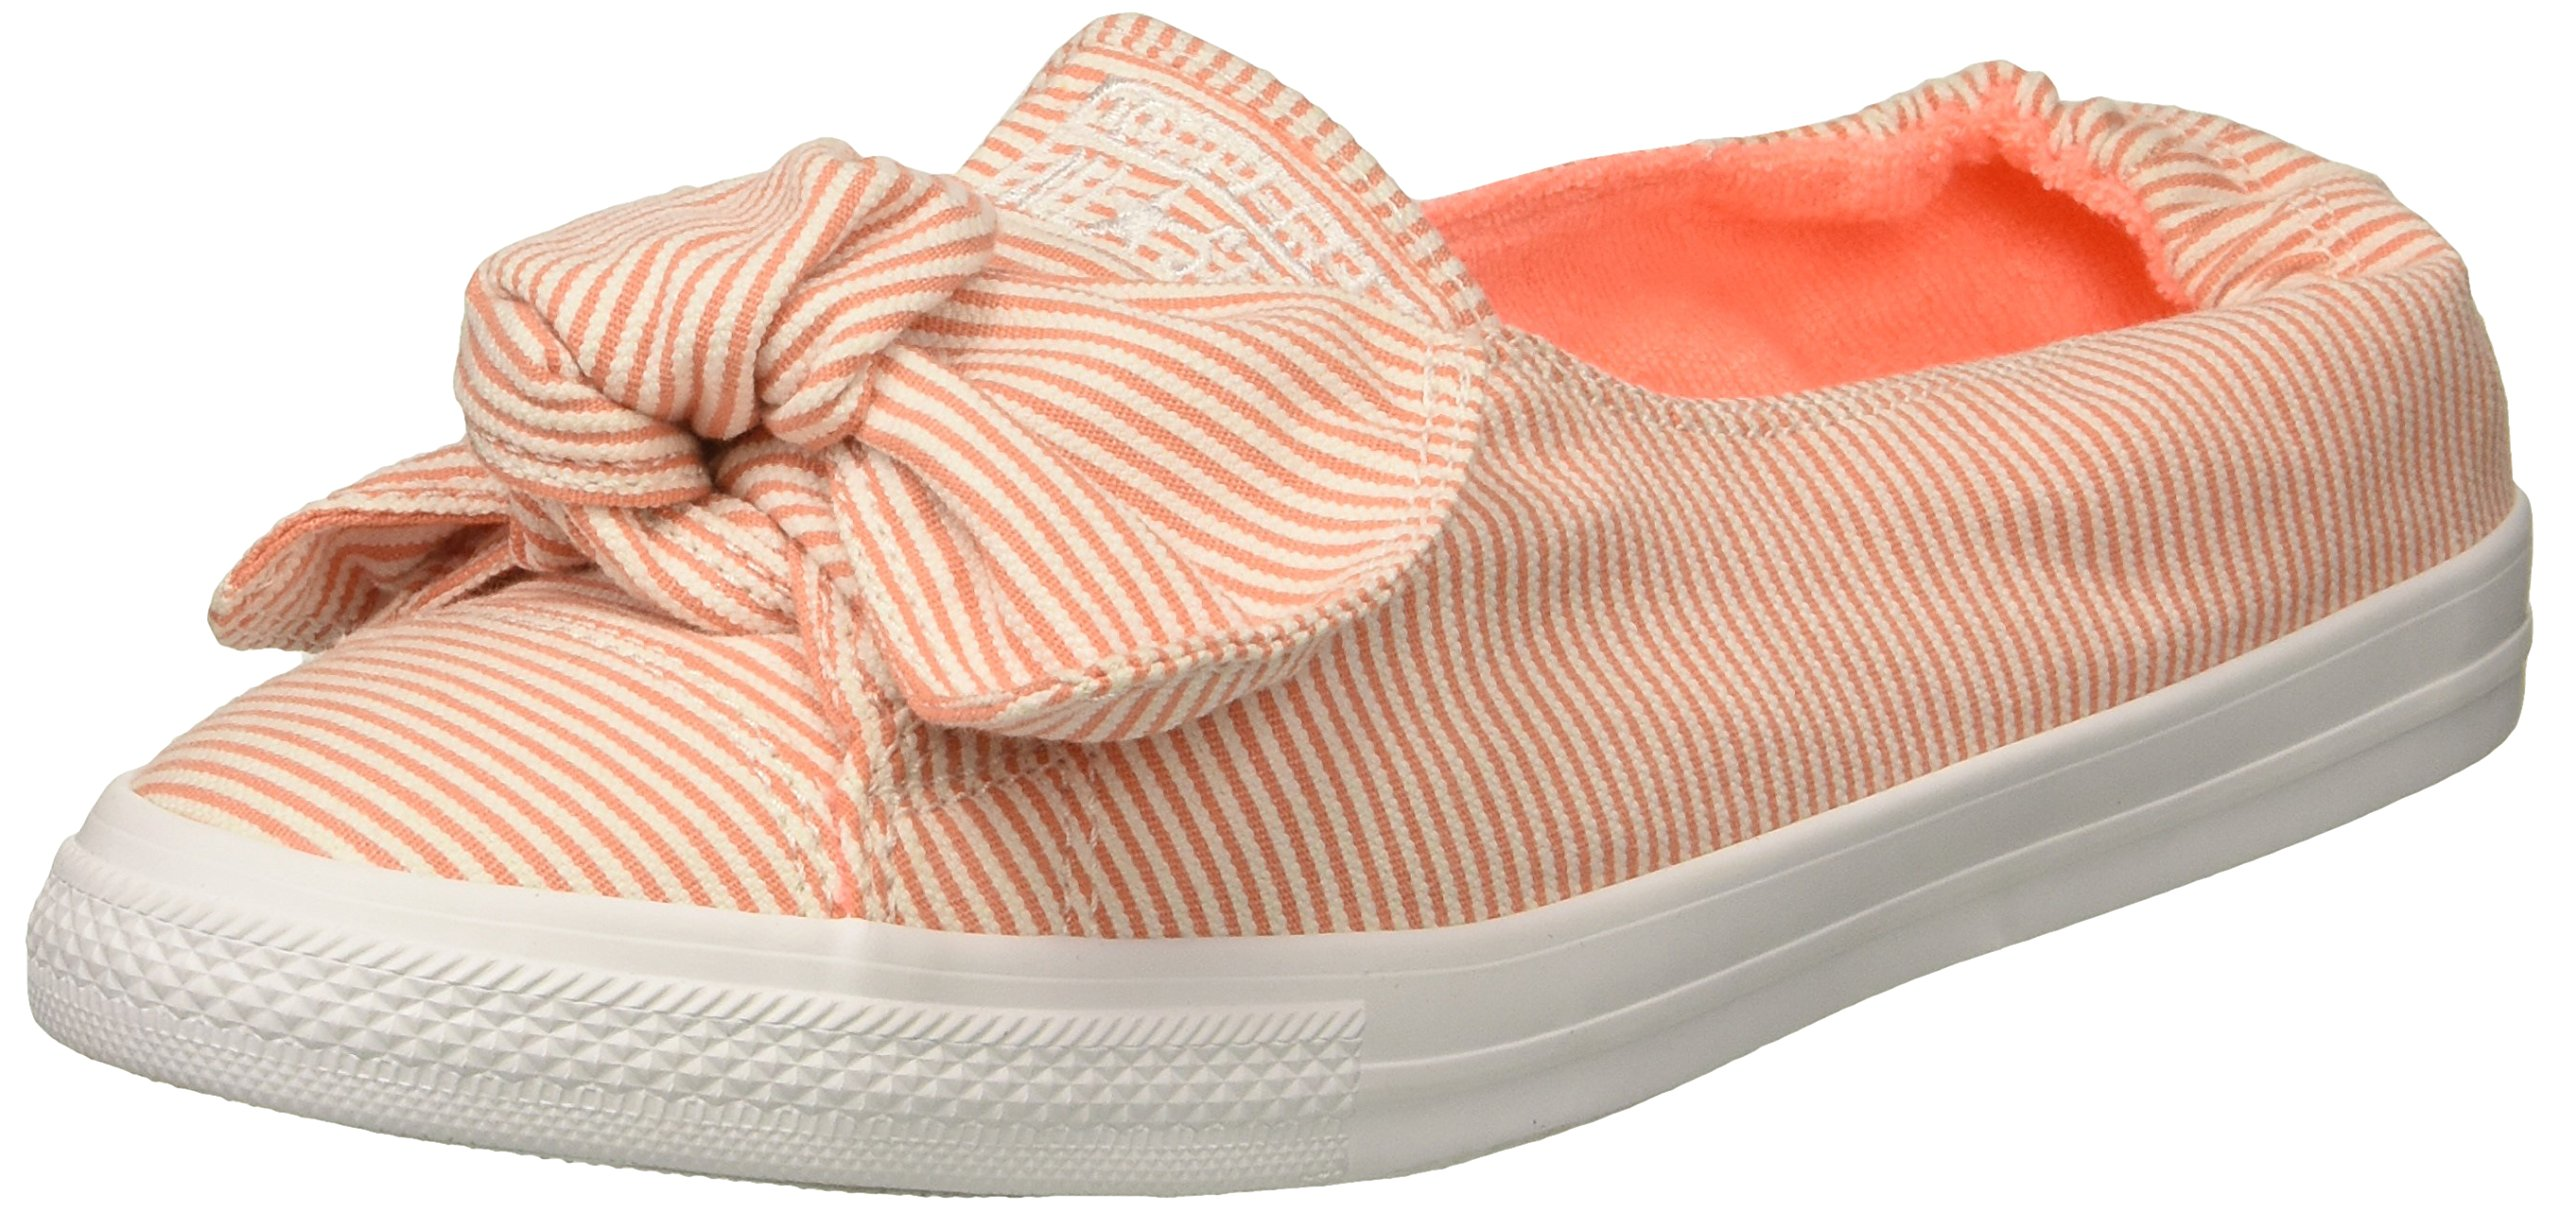 Converse Women's Knot Striped Chambray Slip on Sneaker, Crimson Pulse/White, 9.5 M US